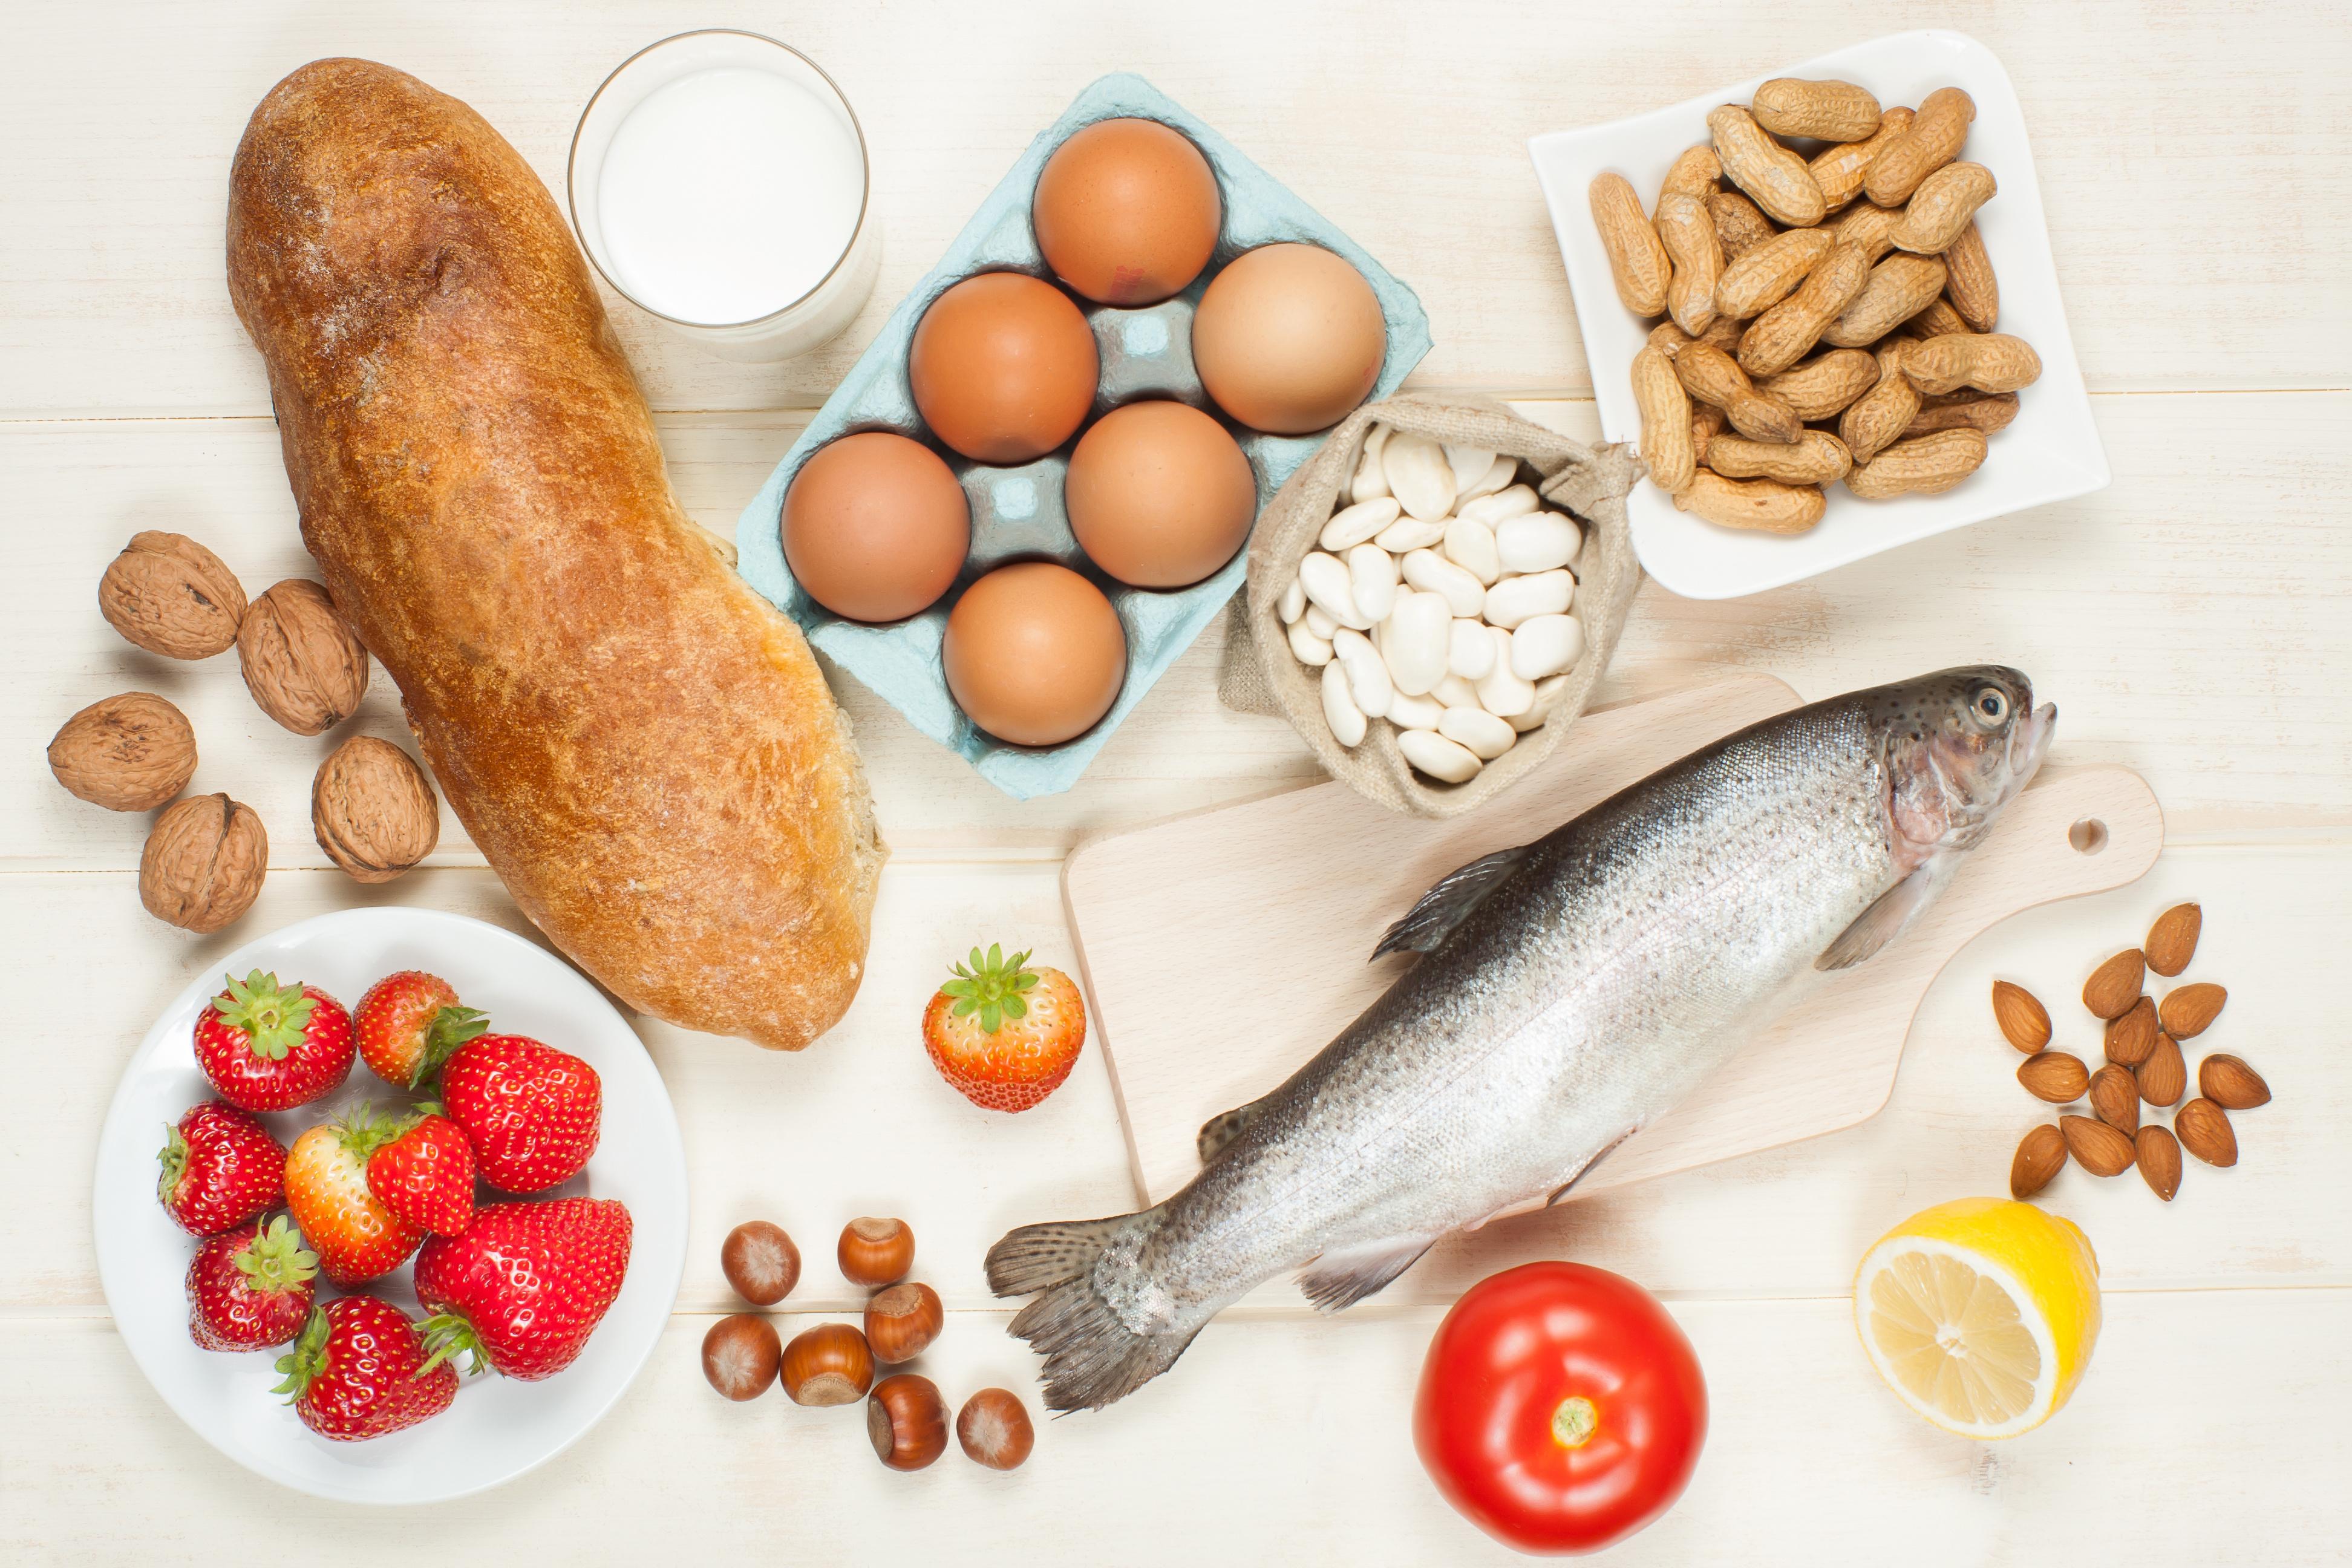 cerromed-intolleranze alimentari